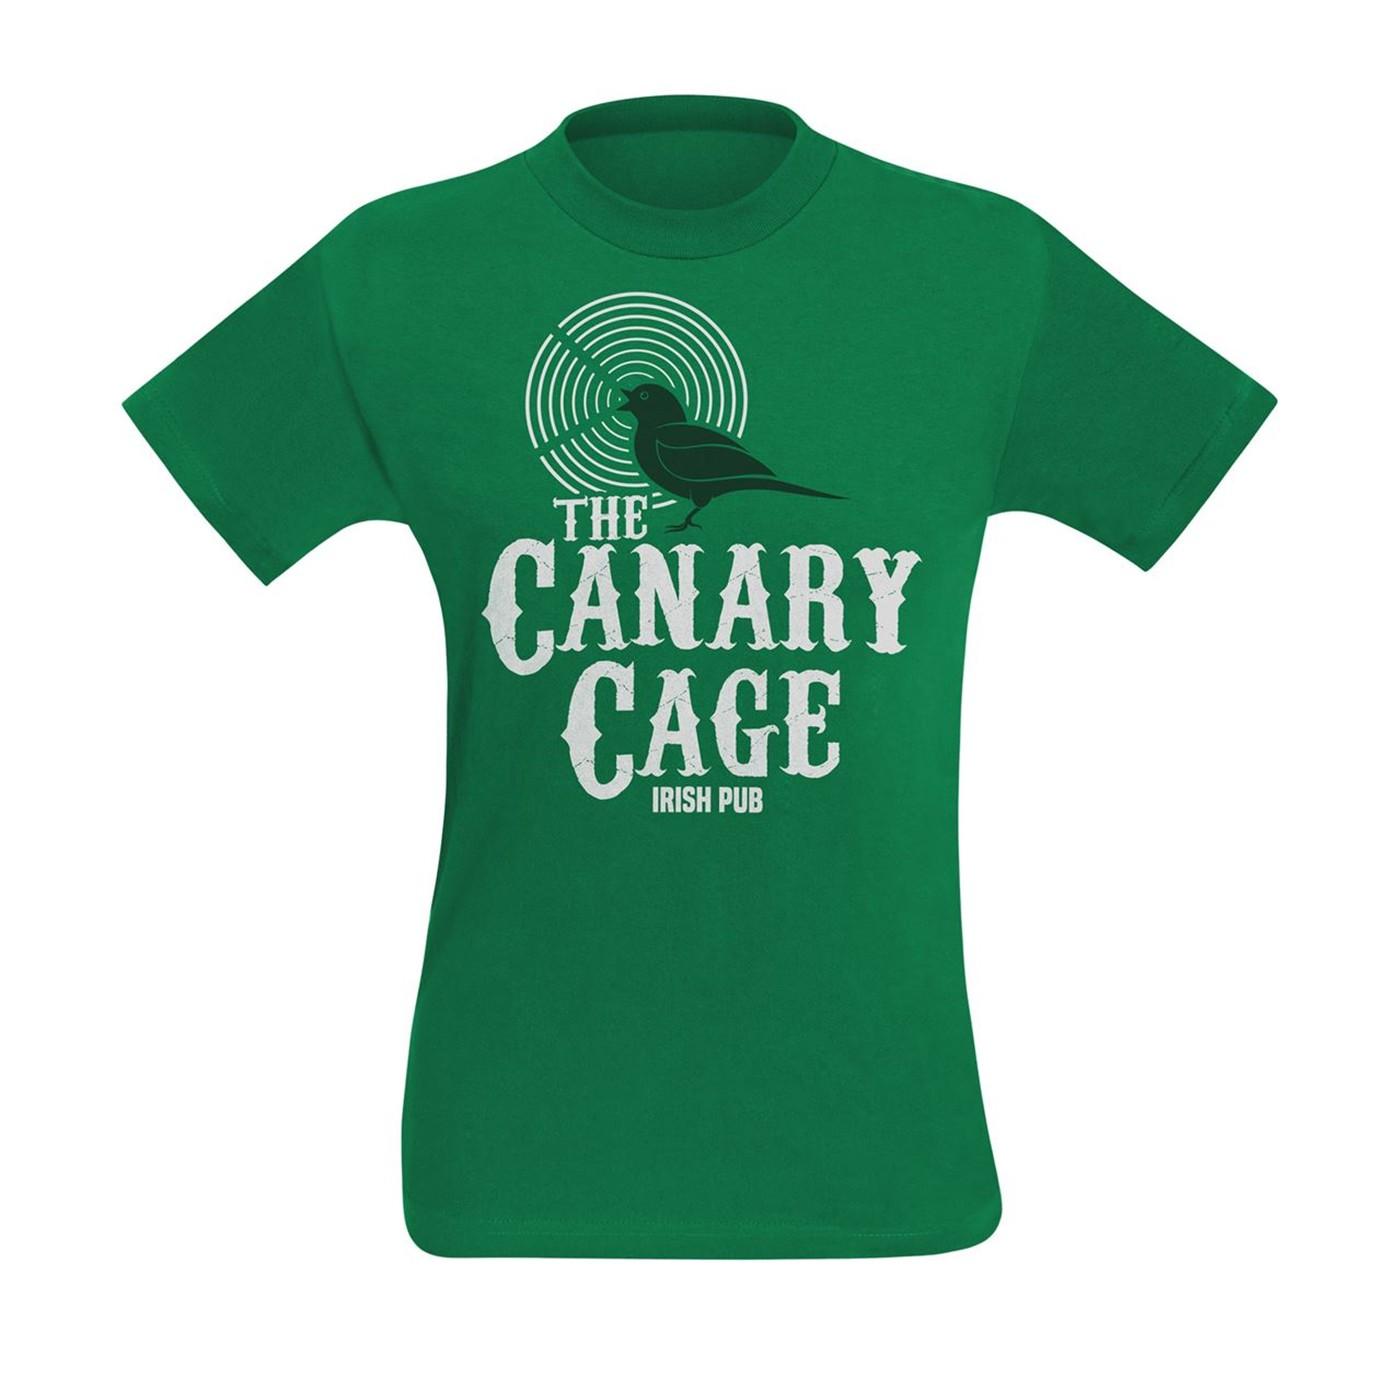 The Canary Cage Irish Pub Men's T-Shirt